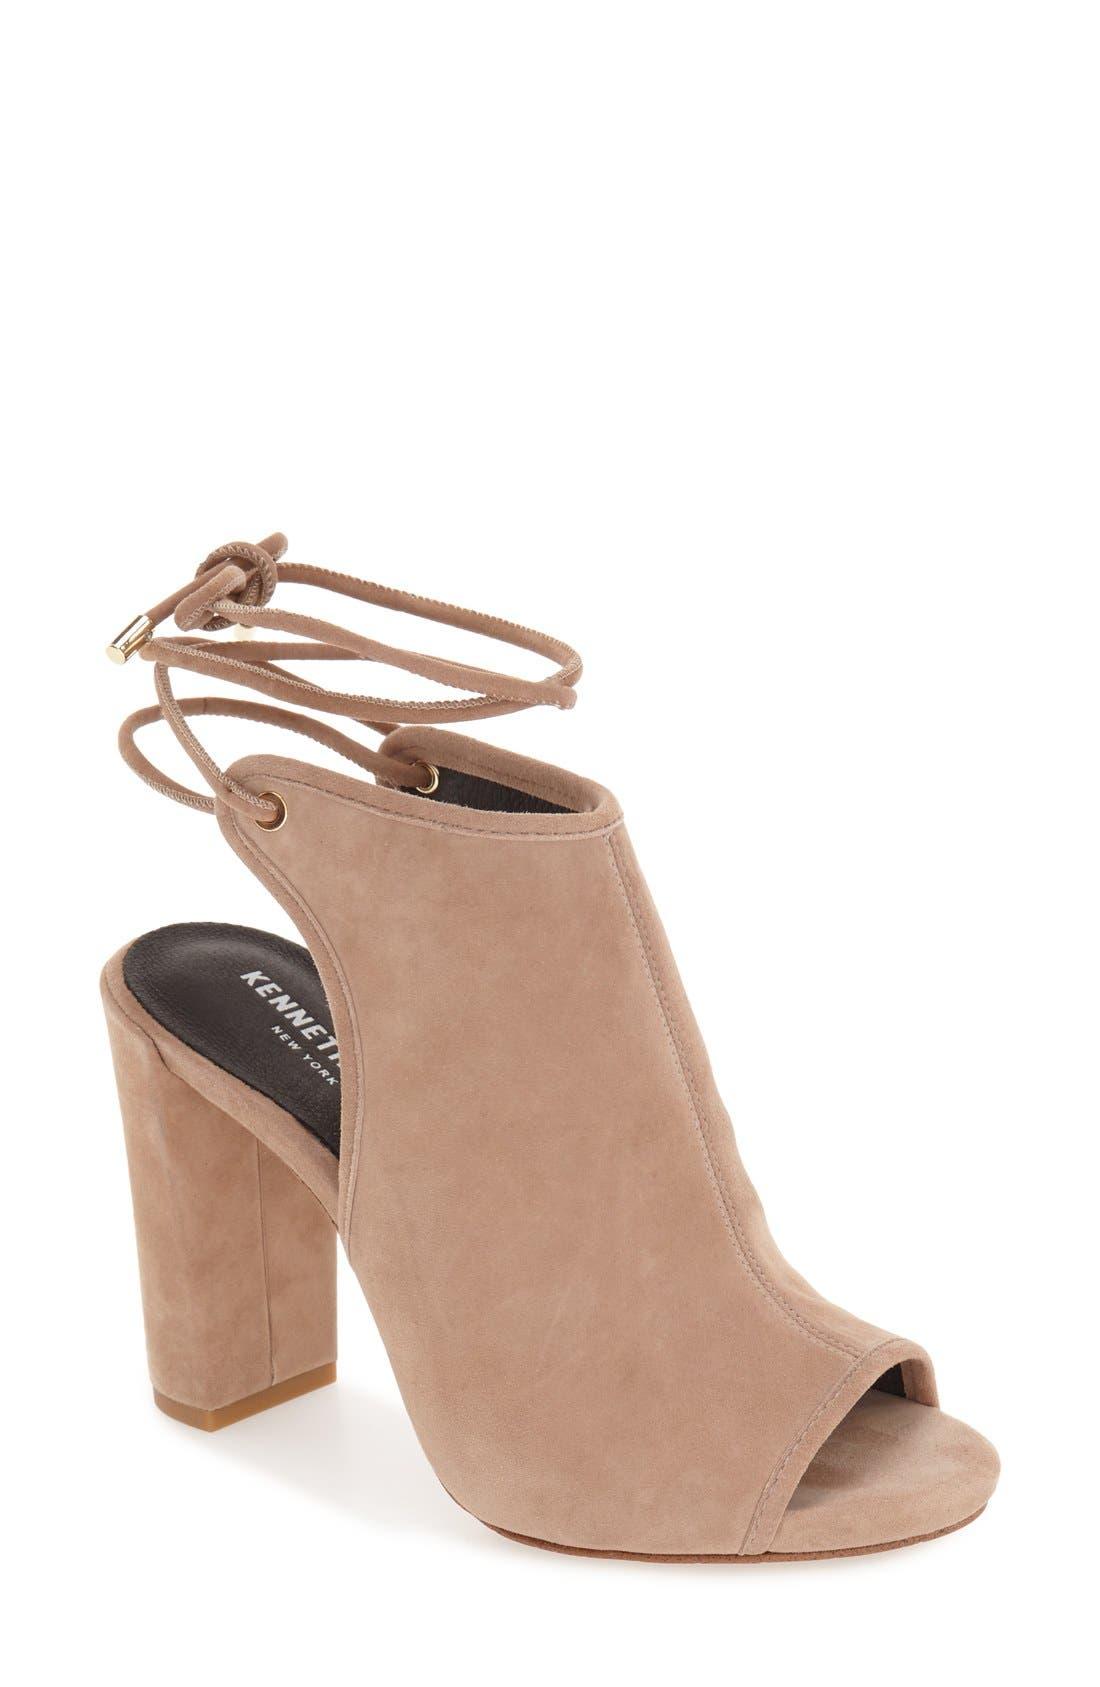 Alternate Image 1 Selected - Kenneth Cole New York Darla Block Heel Sandal (Women)